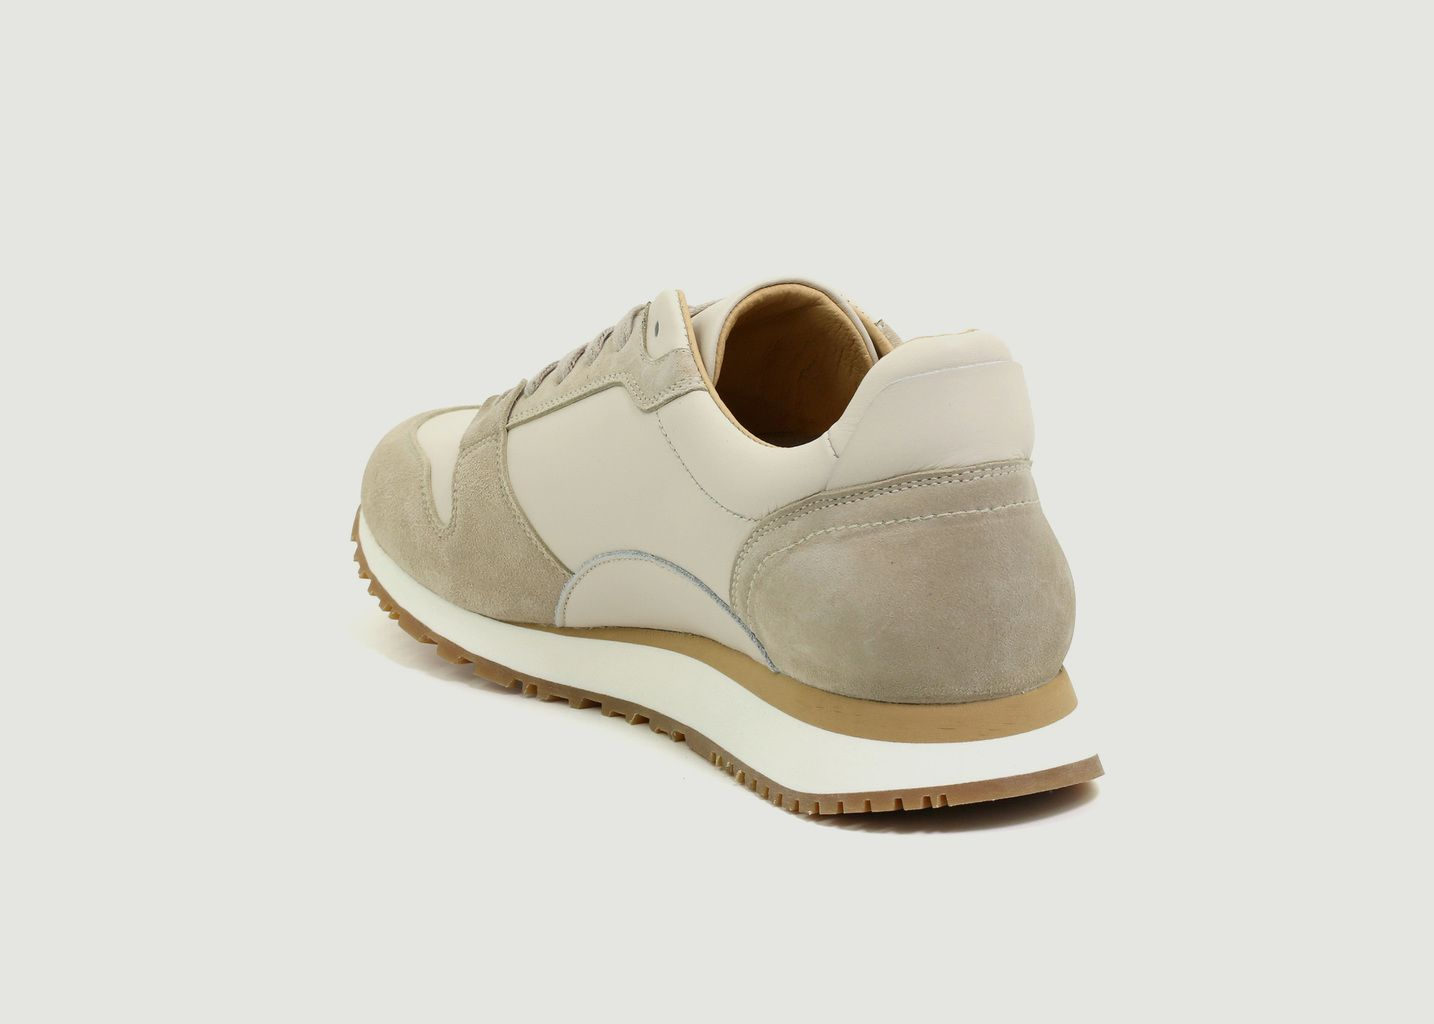 Sneakers Allure Le Coq Sportif  - Le Coq Sportif